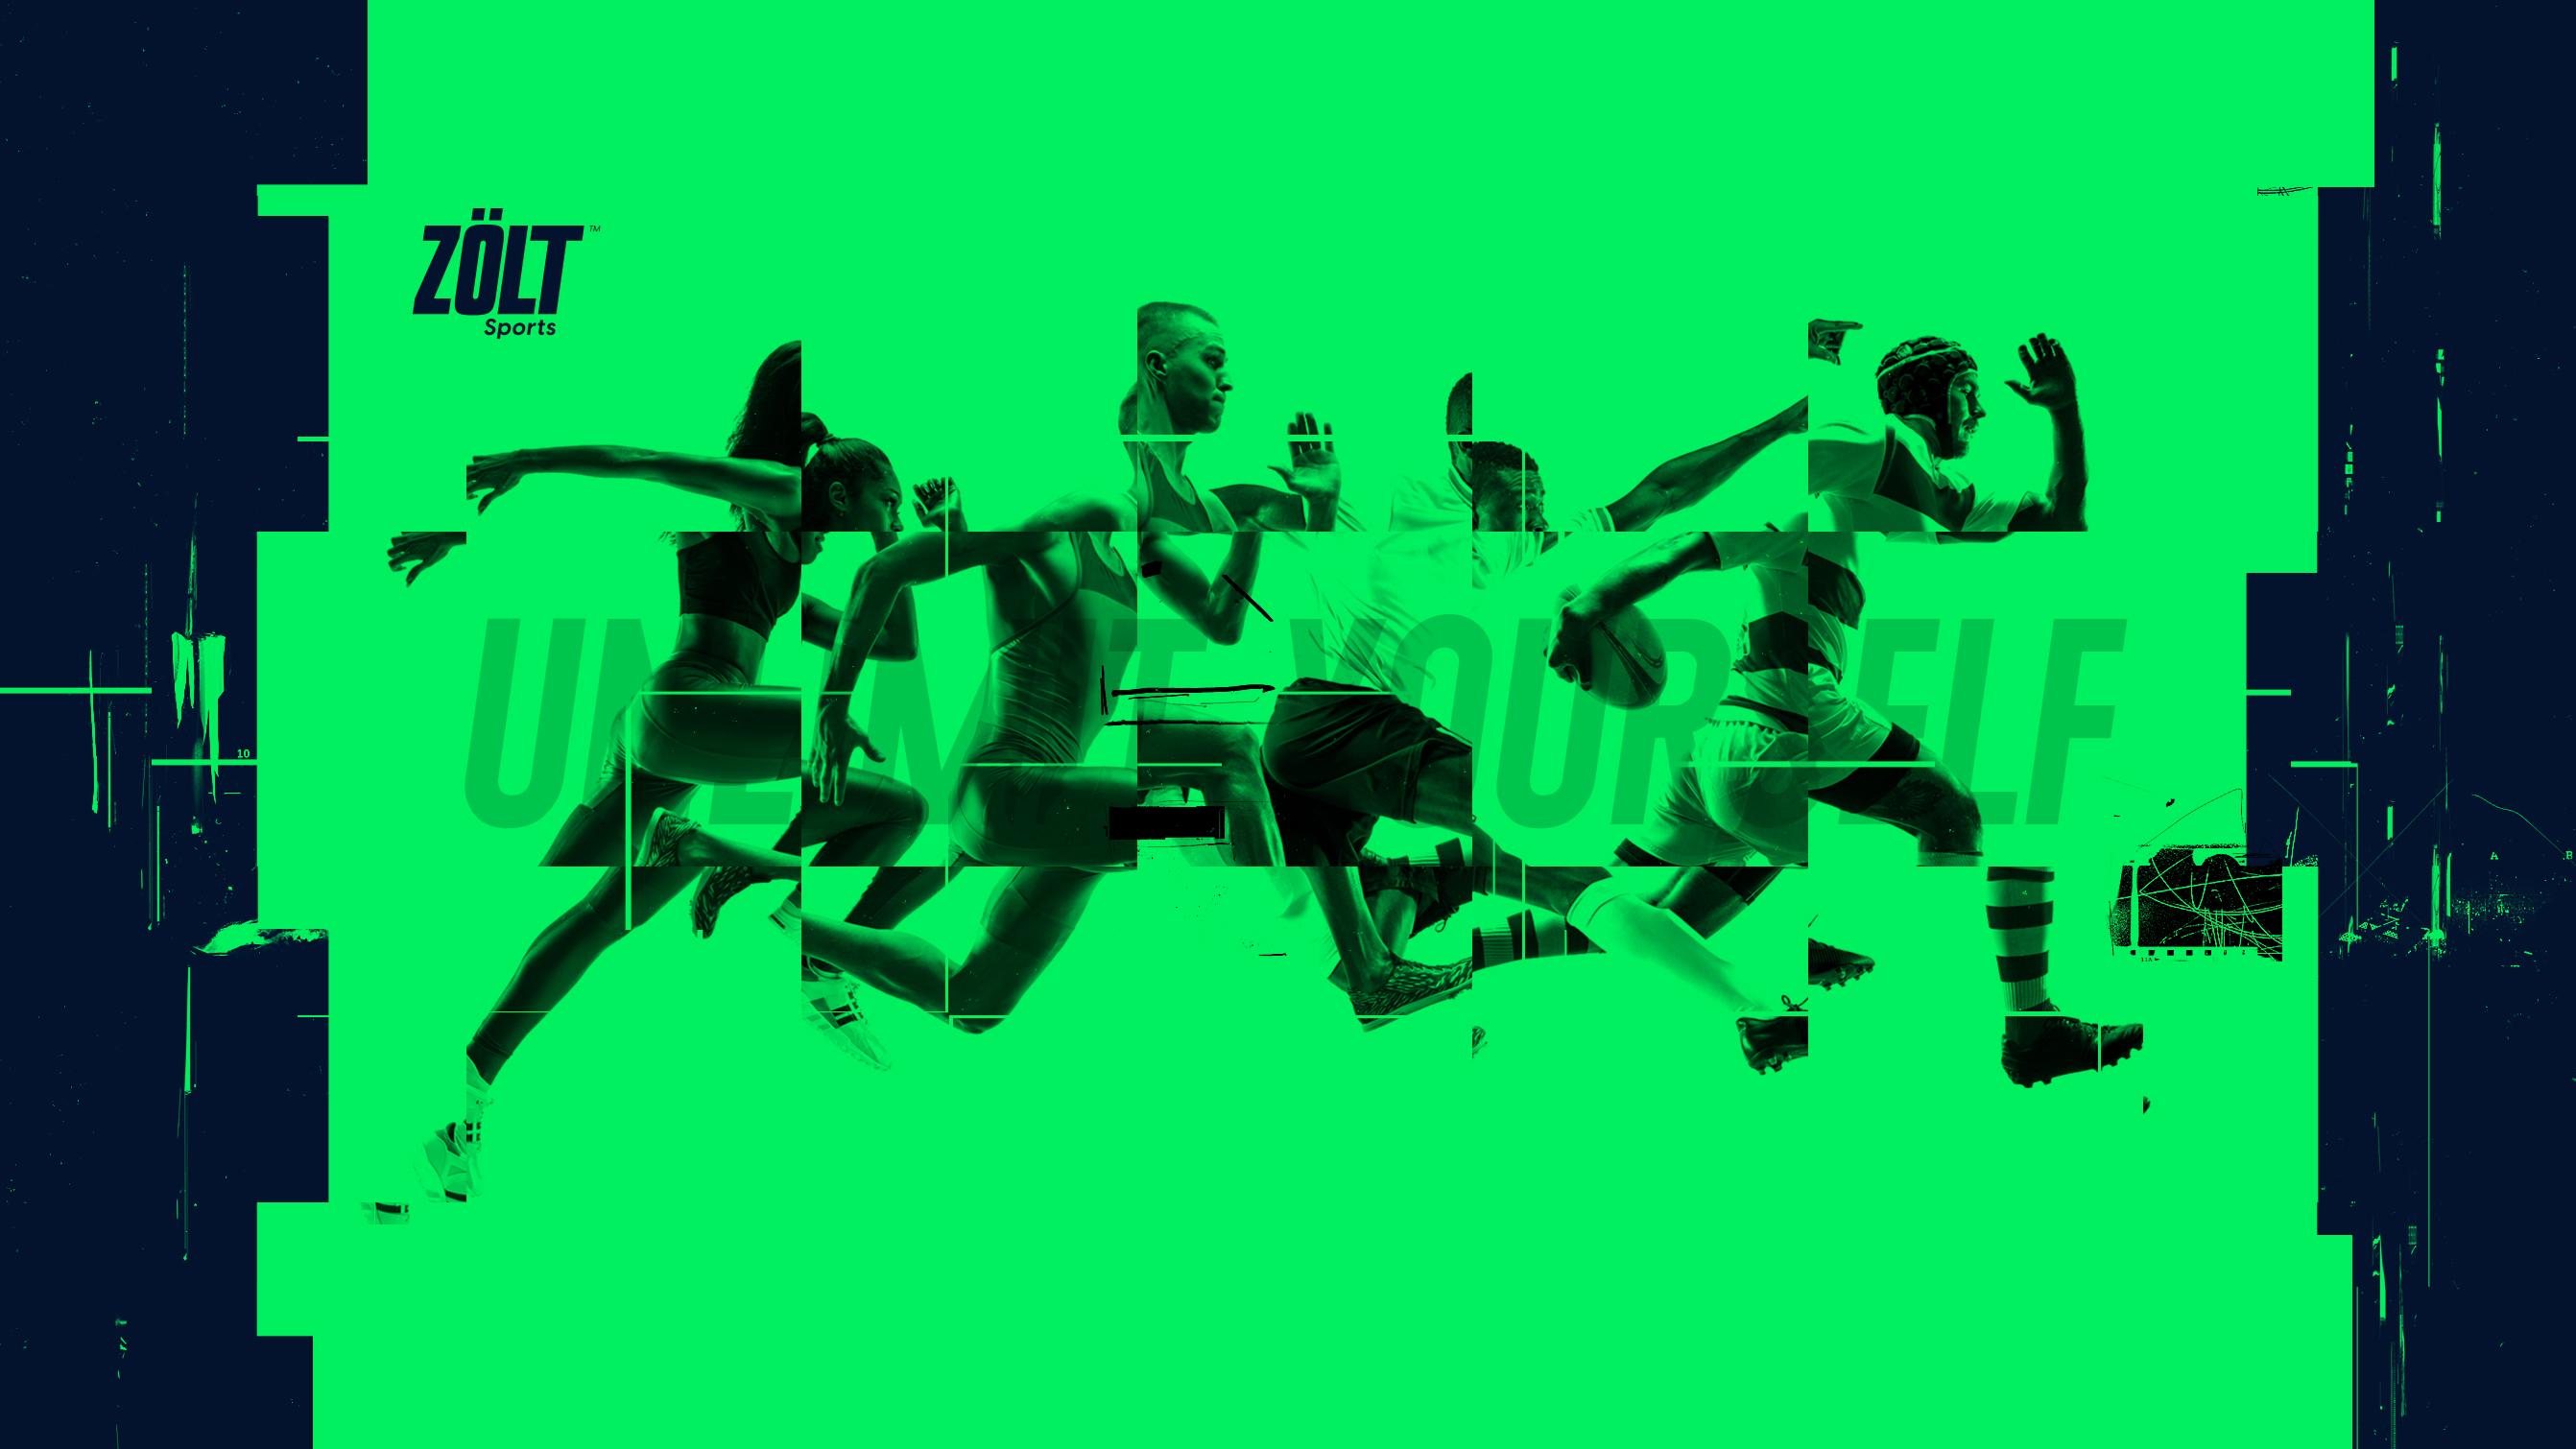 Brand name - client ZÖLT Sports social media post/brand image